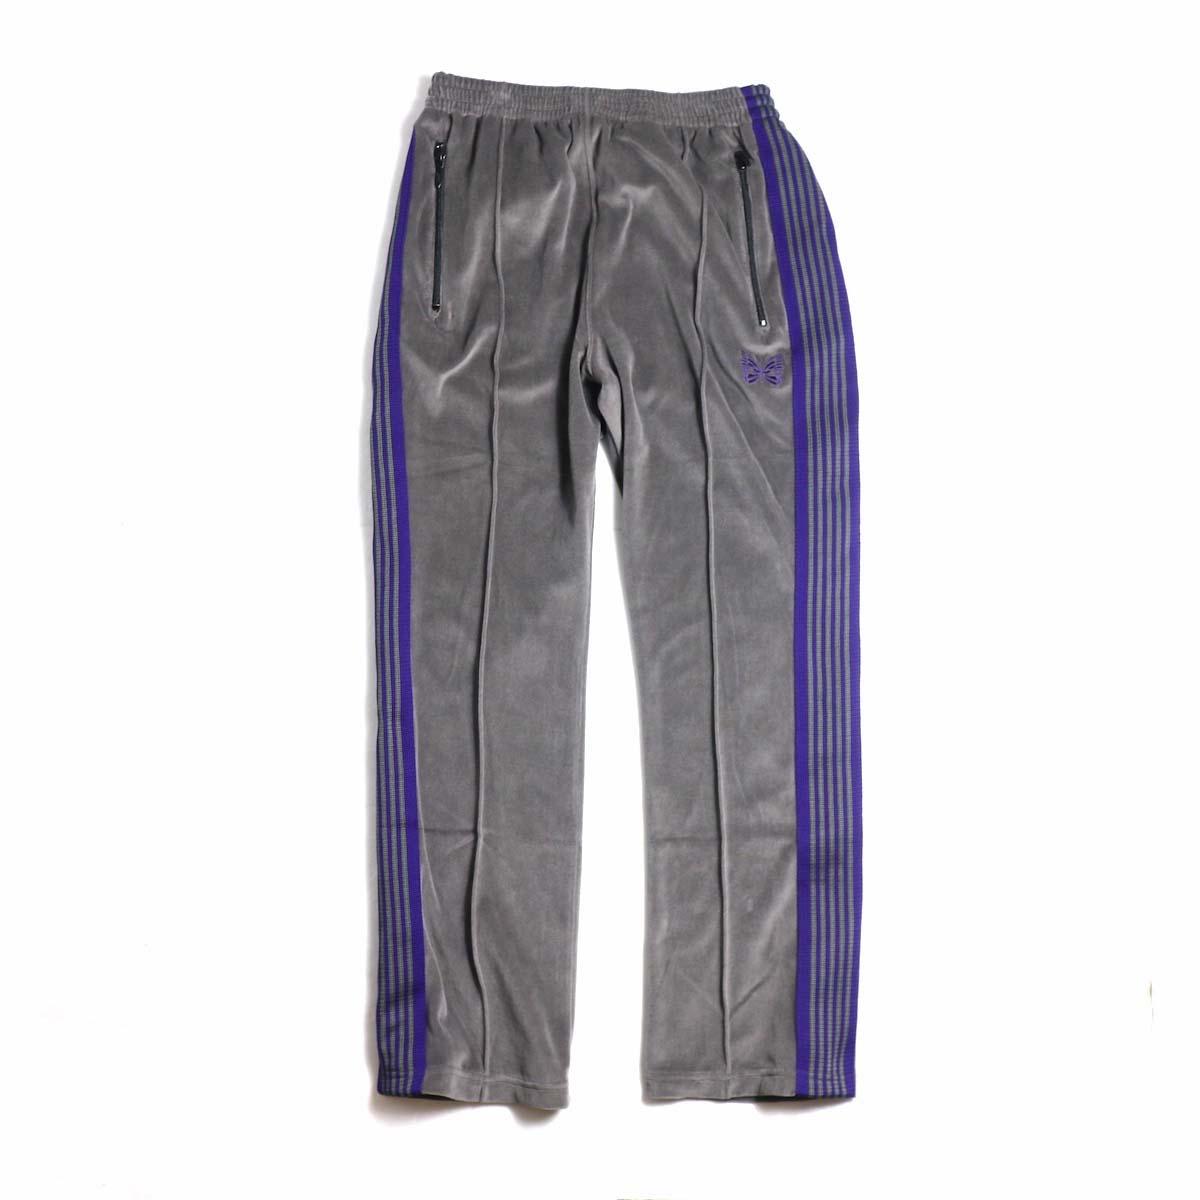 Needles / Narrow Track Pant - C/Pe Velour (Gray)